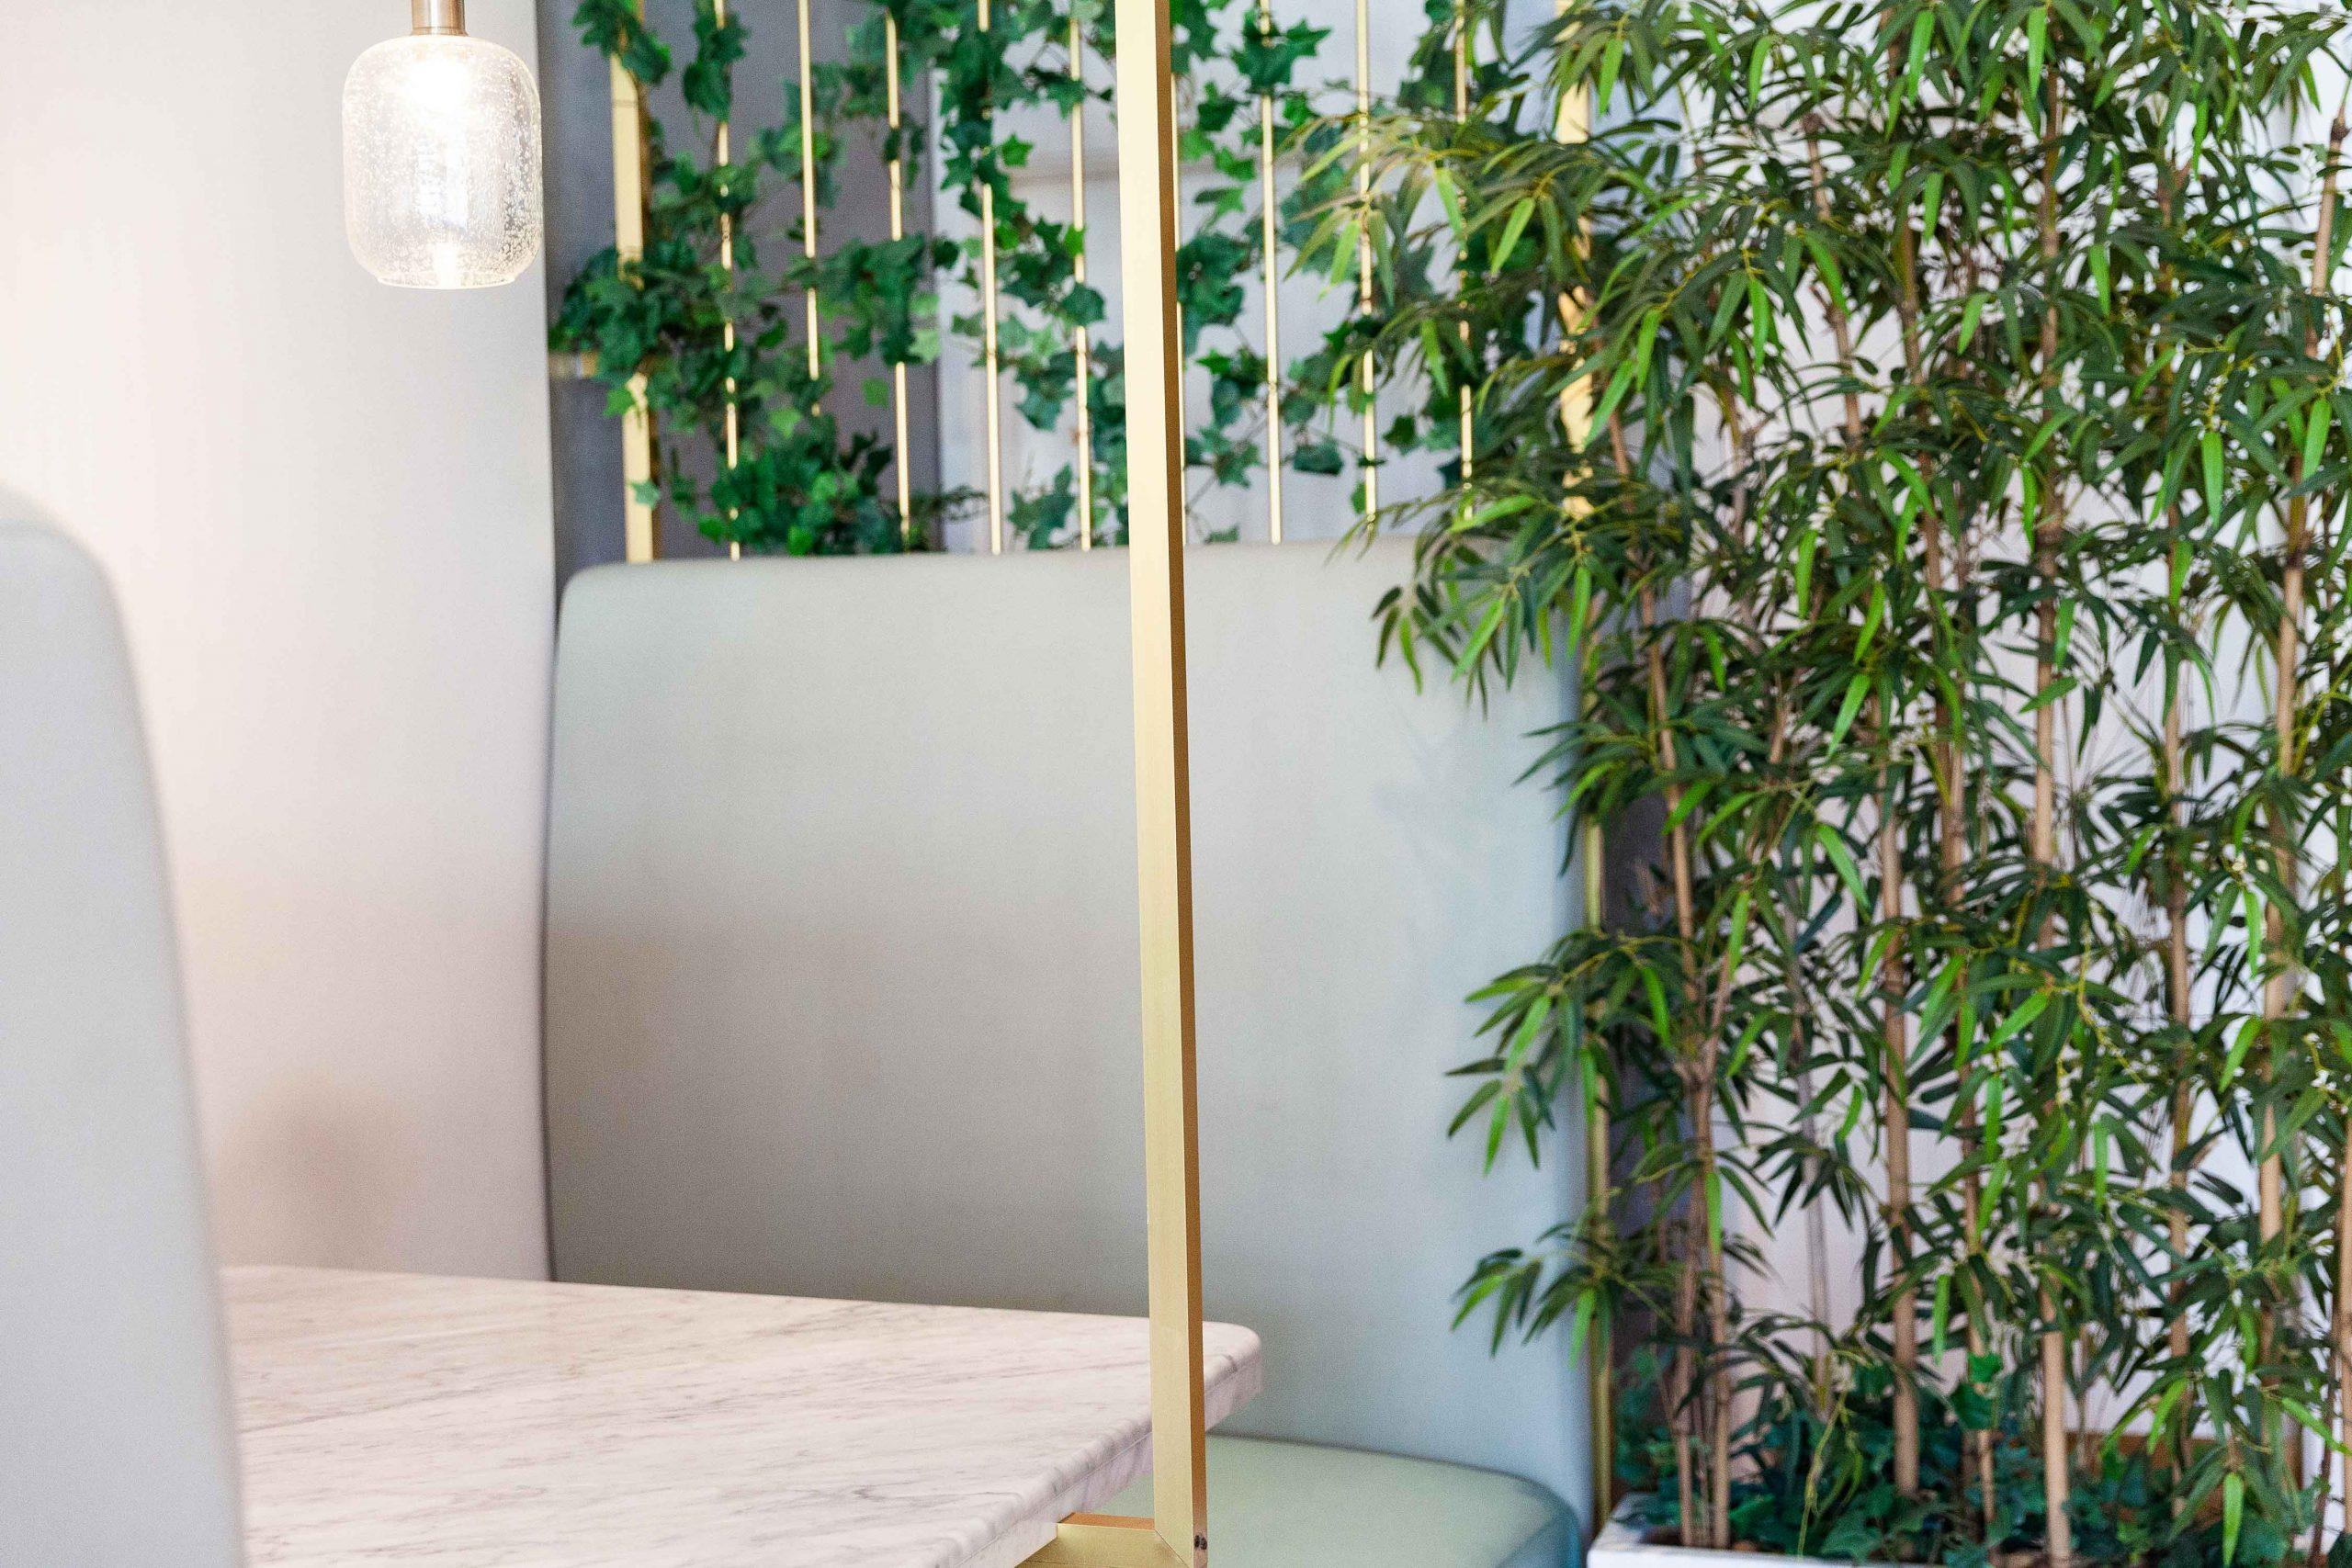 Jarlicious-Interior Design Company in UAE